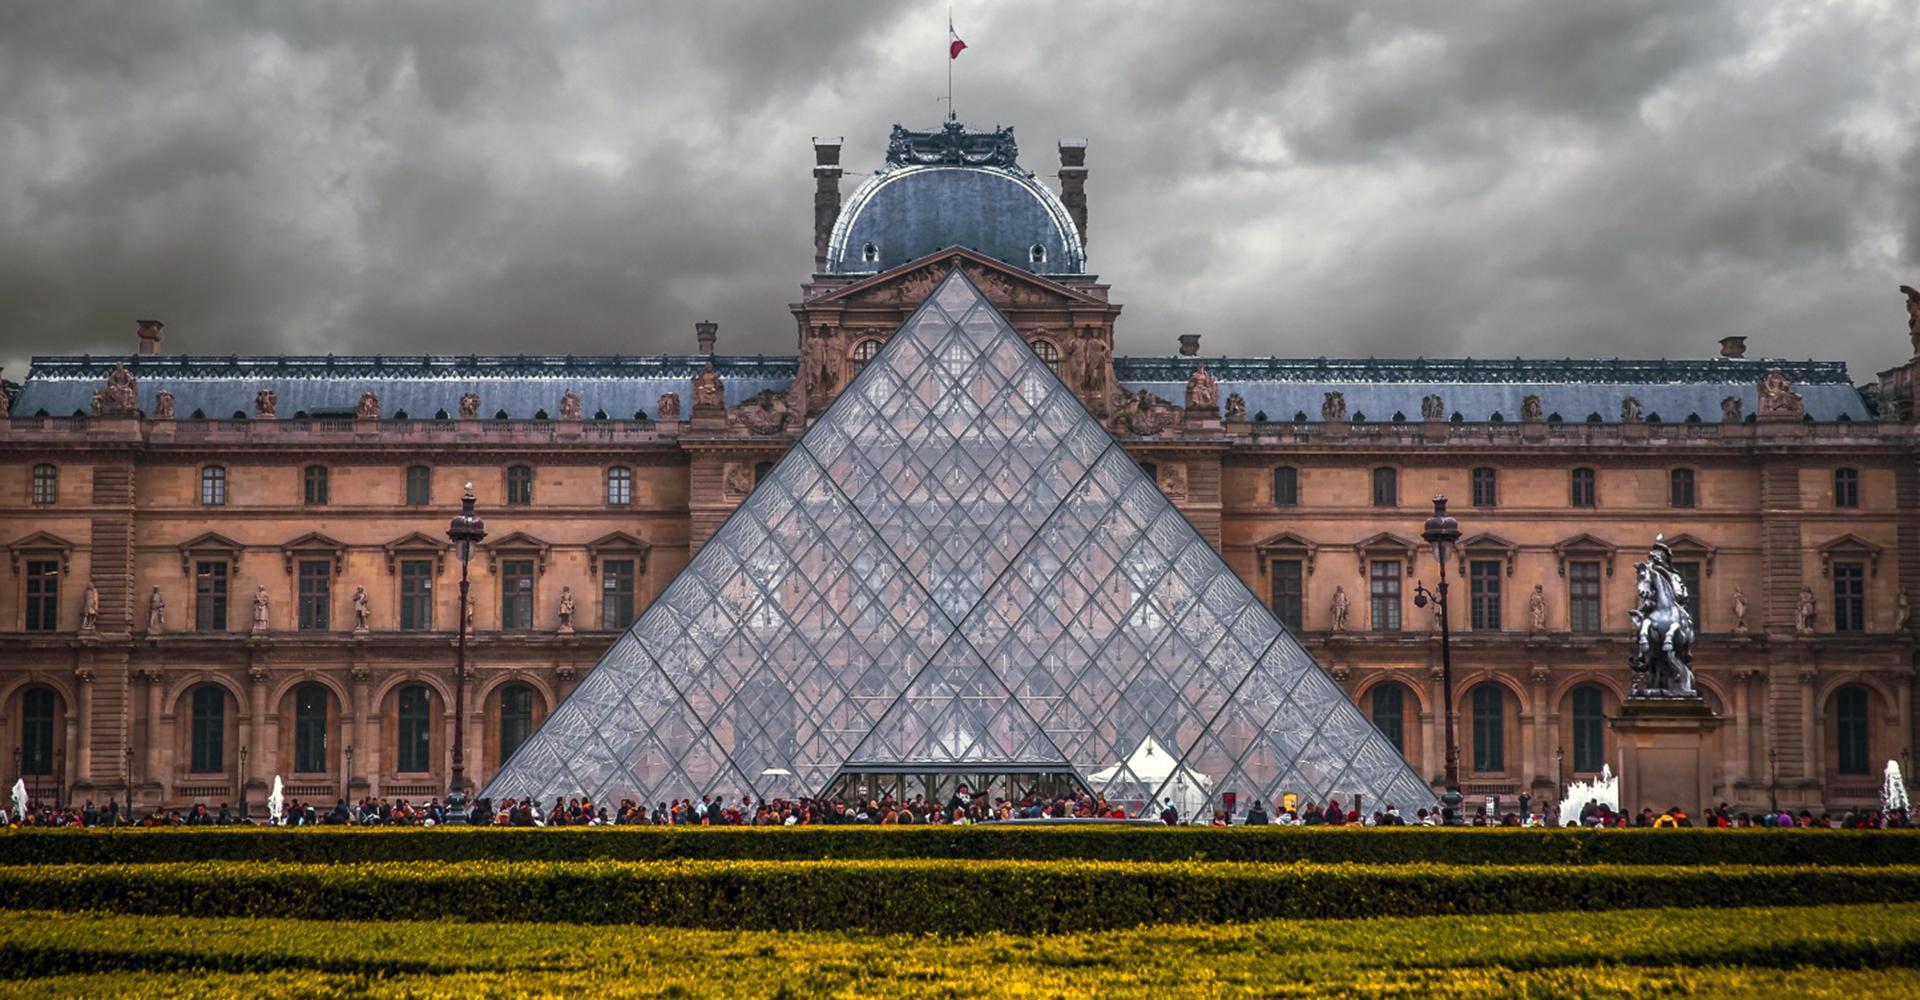 Museo del Louvre Paris en Francia